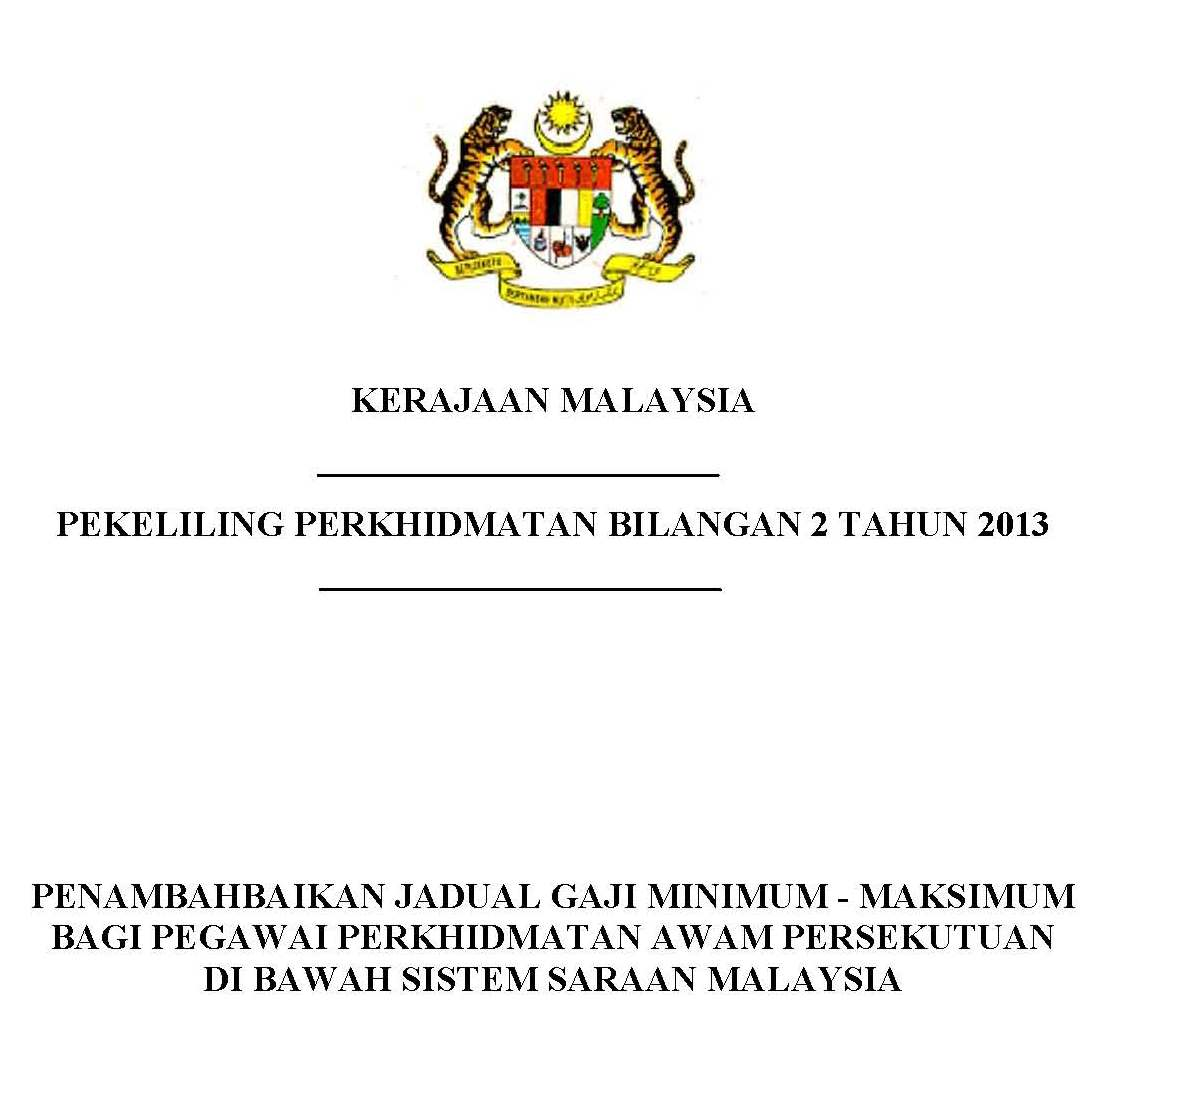 Pekeliling Jadual Gaji Minimum - Maksimum 2013